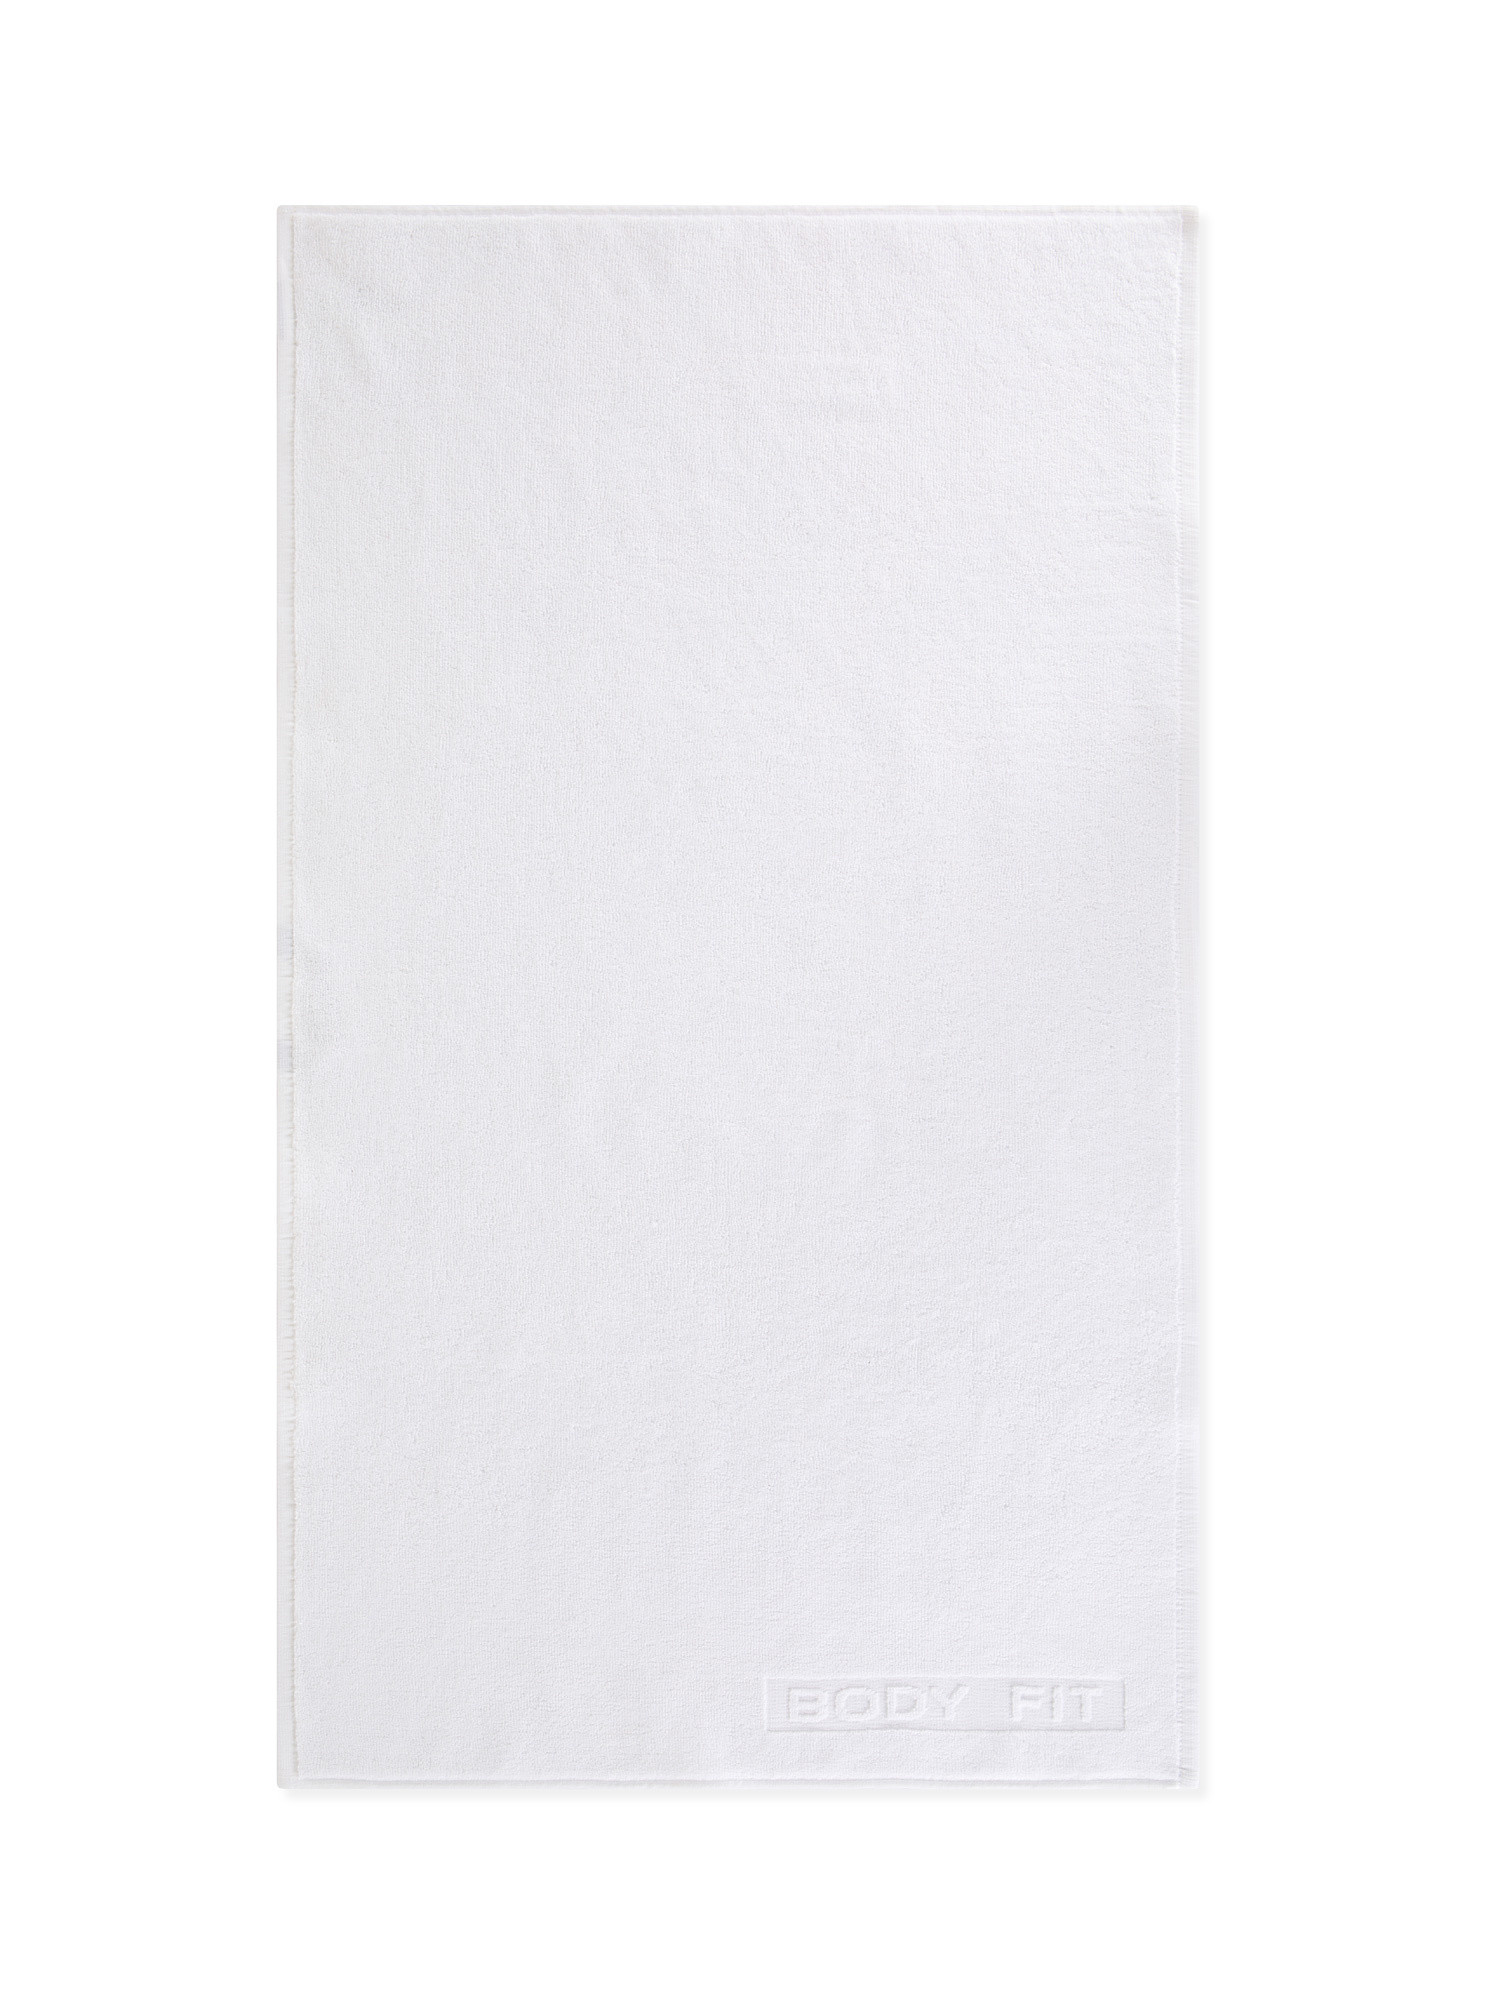 Asciugamano capelli spugna di cotone tinta unita, Bianco, large image number 1